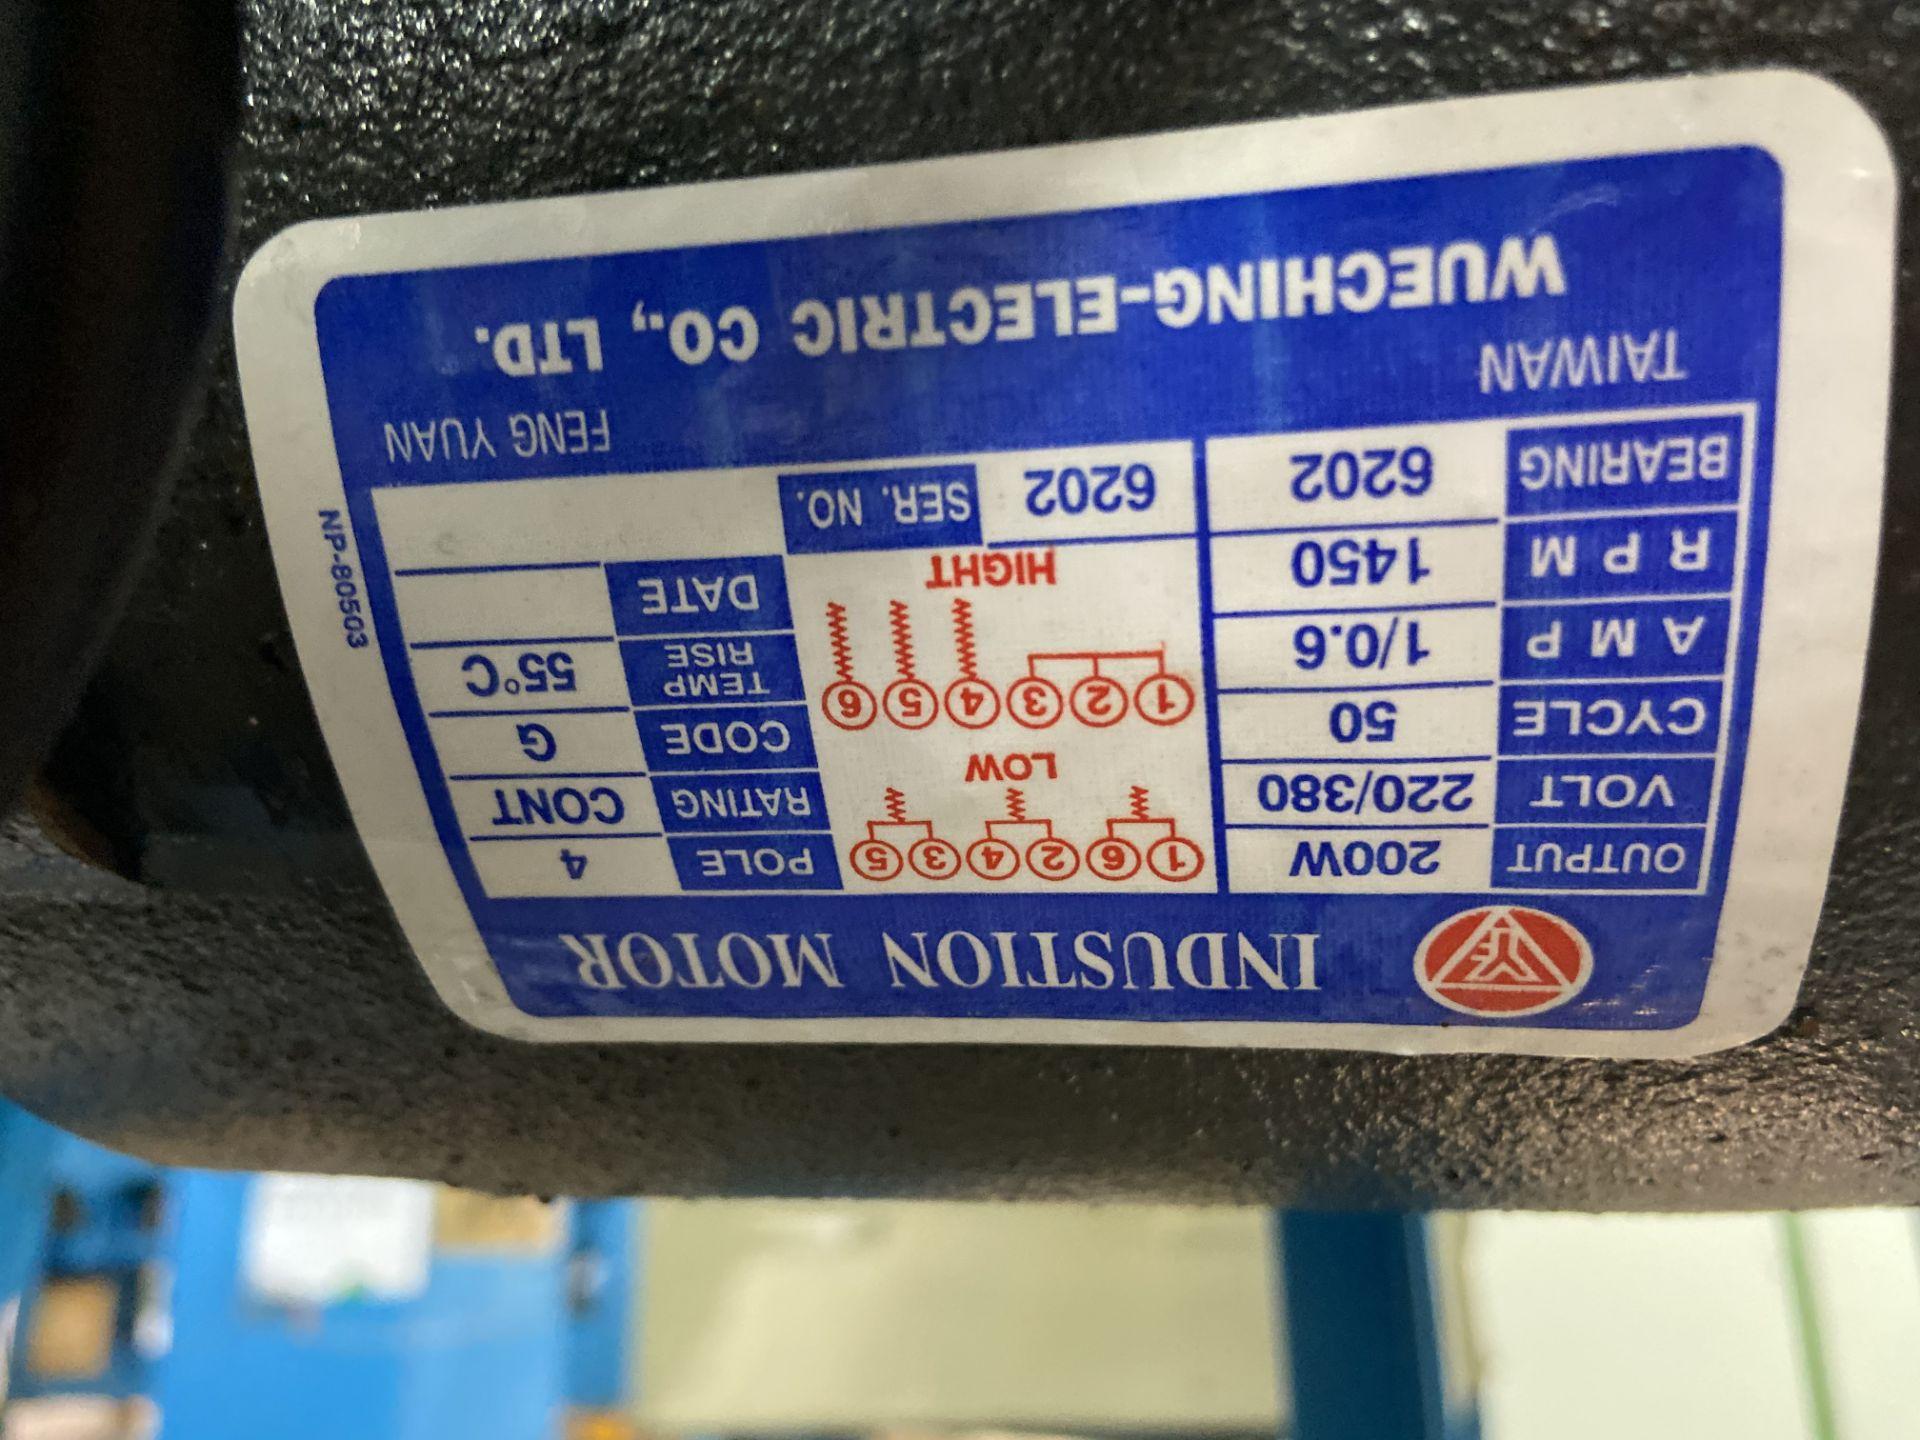 Lot 25 - Prensa de grommet marca Ho Hung Ming Enterprises